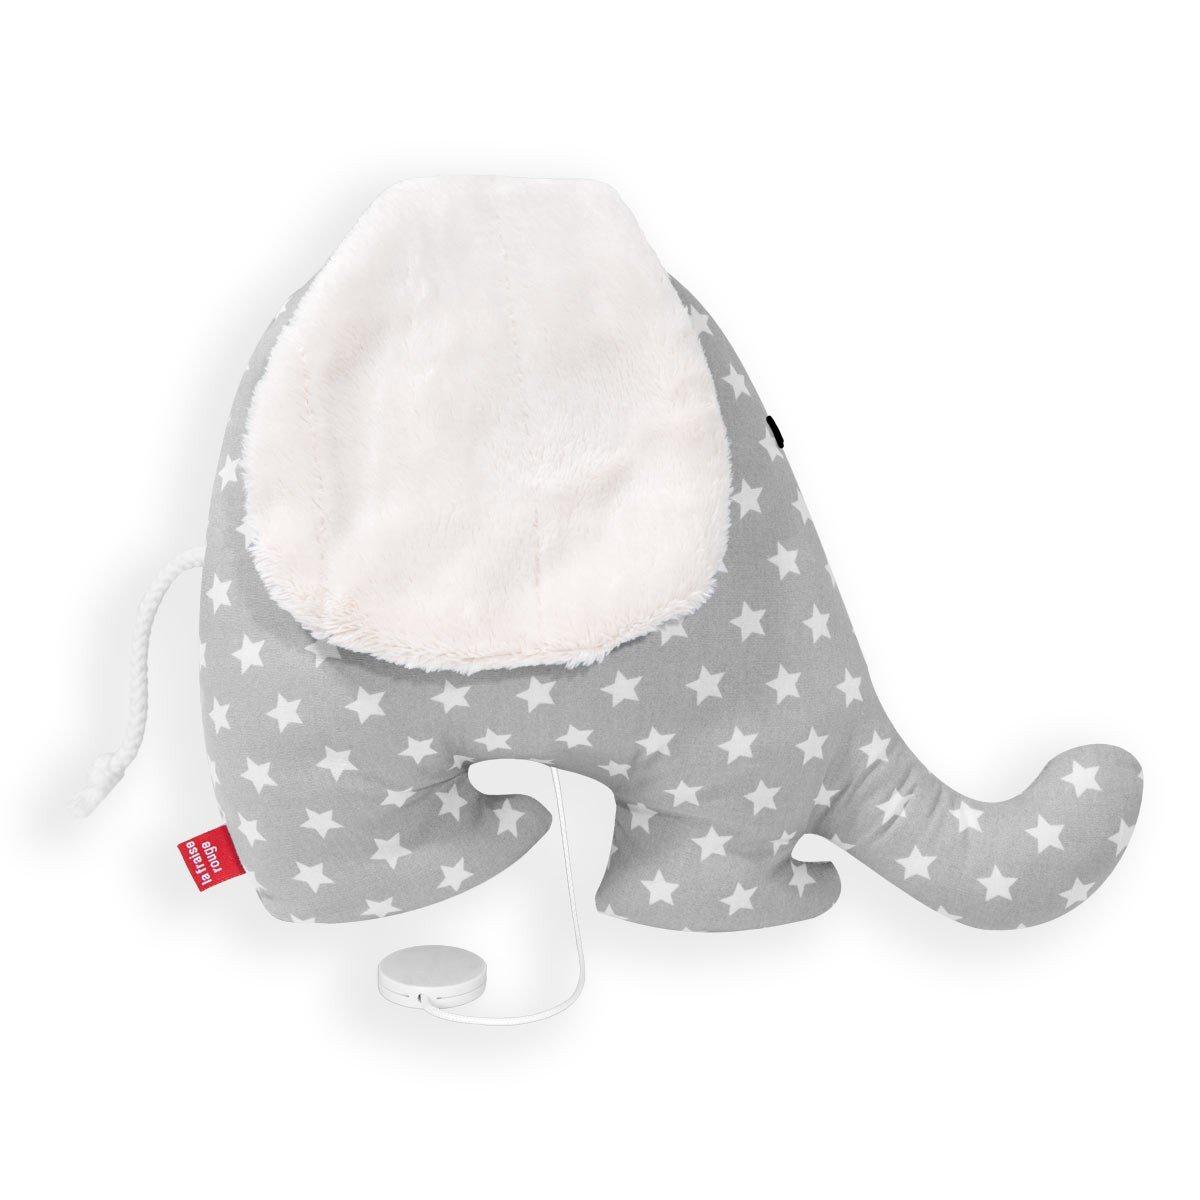 La Fraise Rouge 155610 155610 155610 Spieluhr Elefant Antoine (Schlaf Kindlein), M, grau 3d1b69